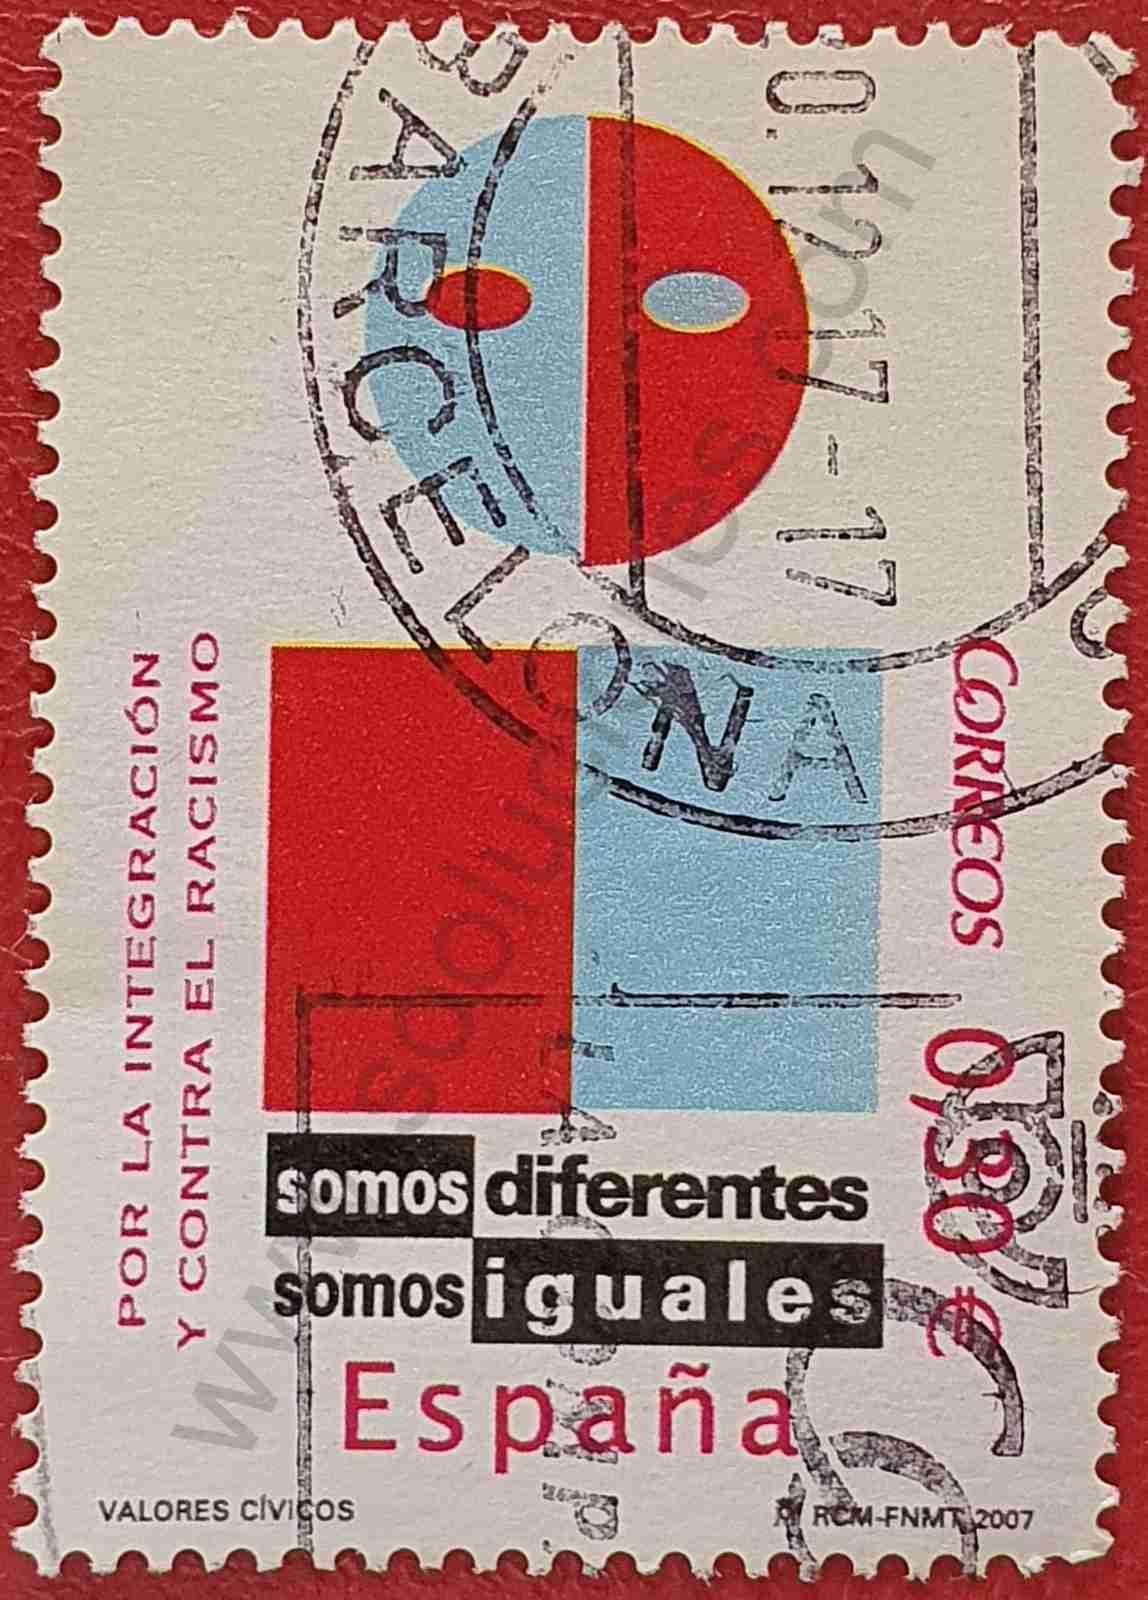 Sello Contra el racismo - España 2007